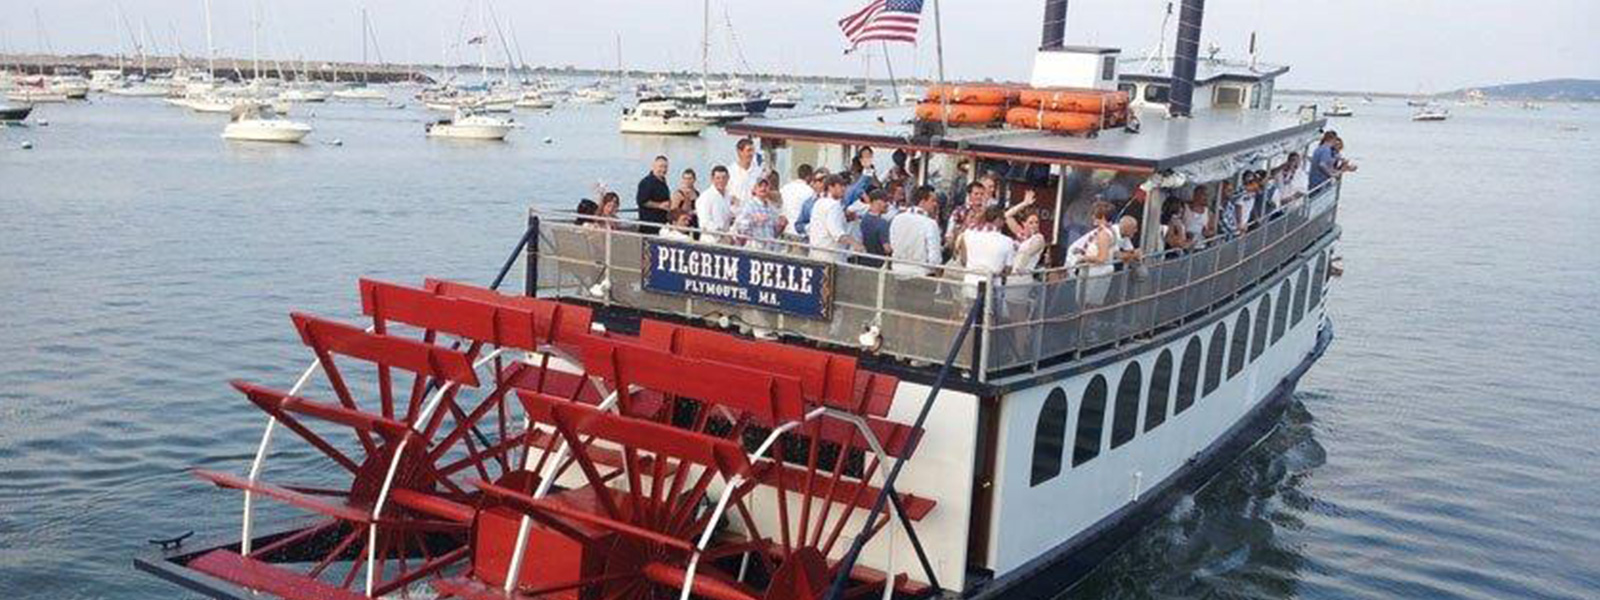 Pilgrim Belle Cruises Plymouth